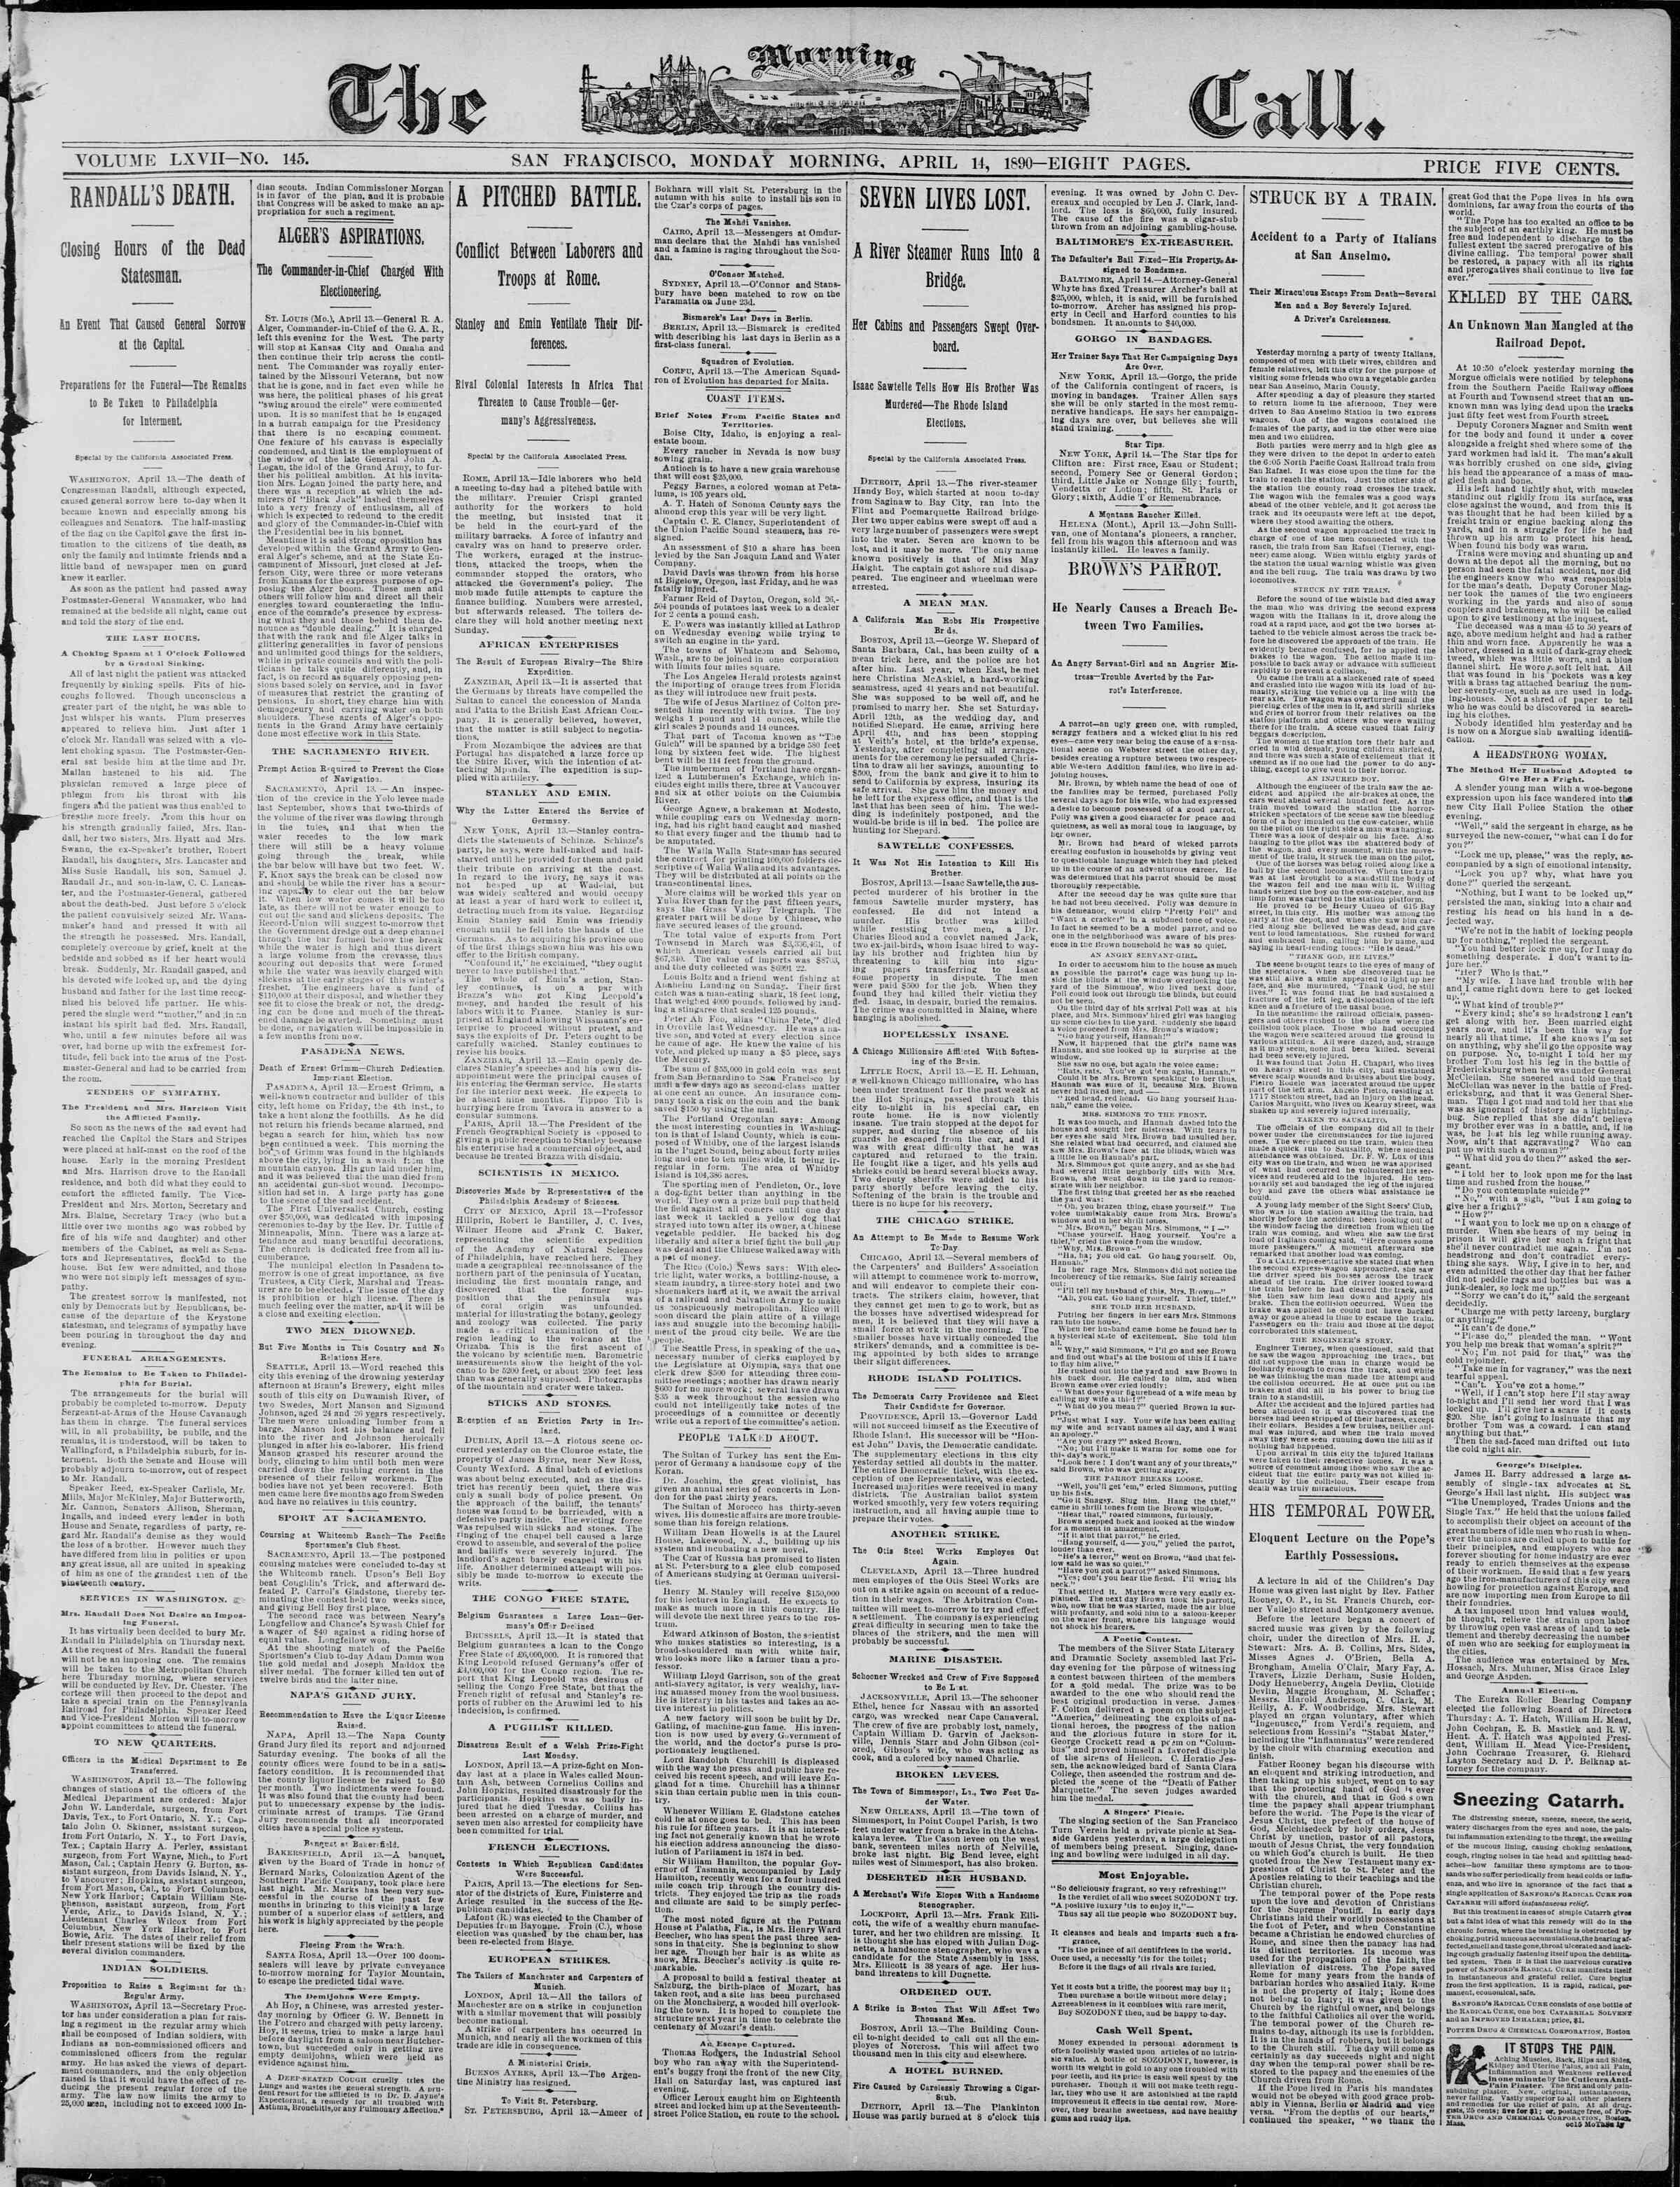 14 Nisan 1890 Tarihli The Morning Call (San Francisco) Dergisi Sayfa 1